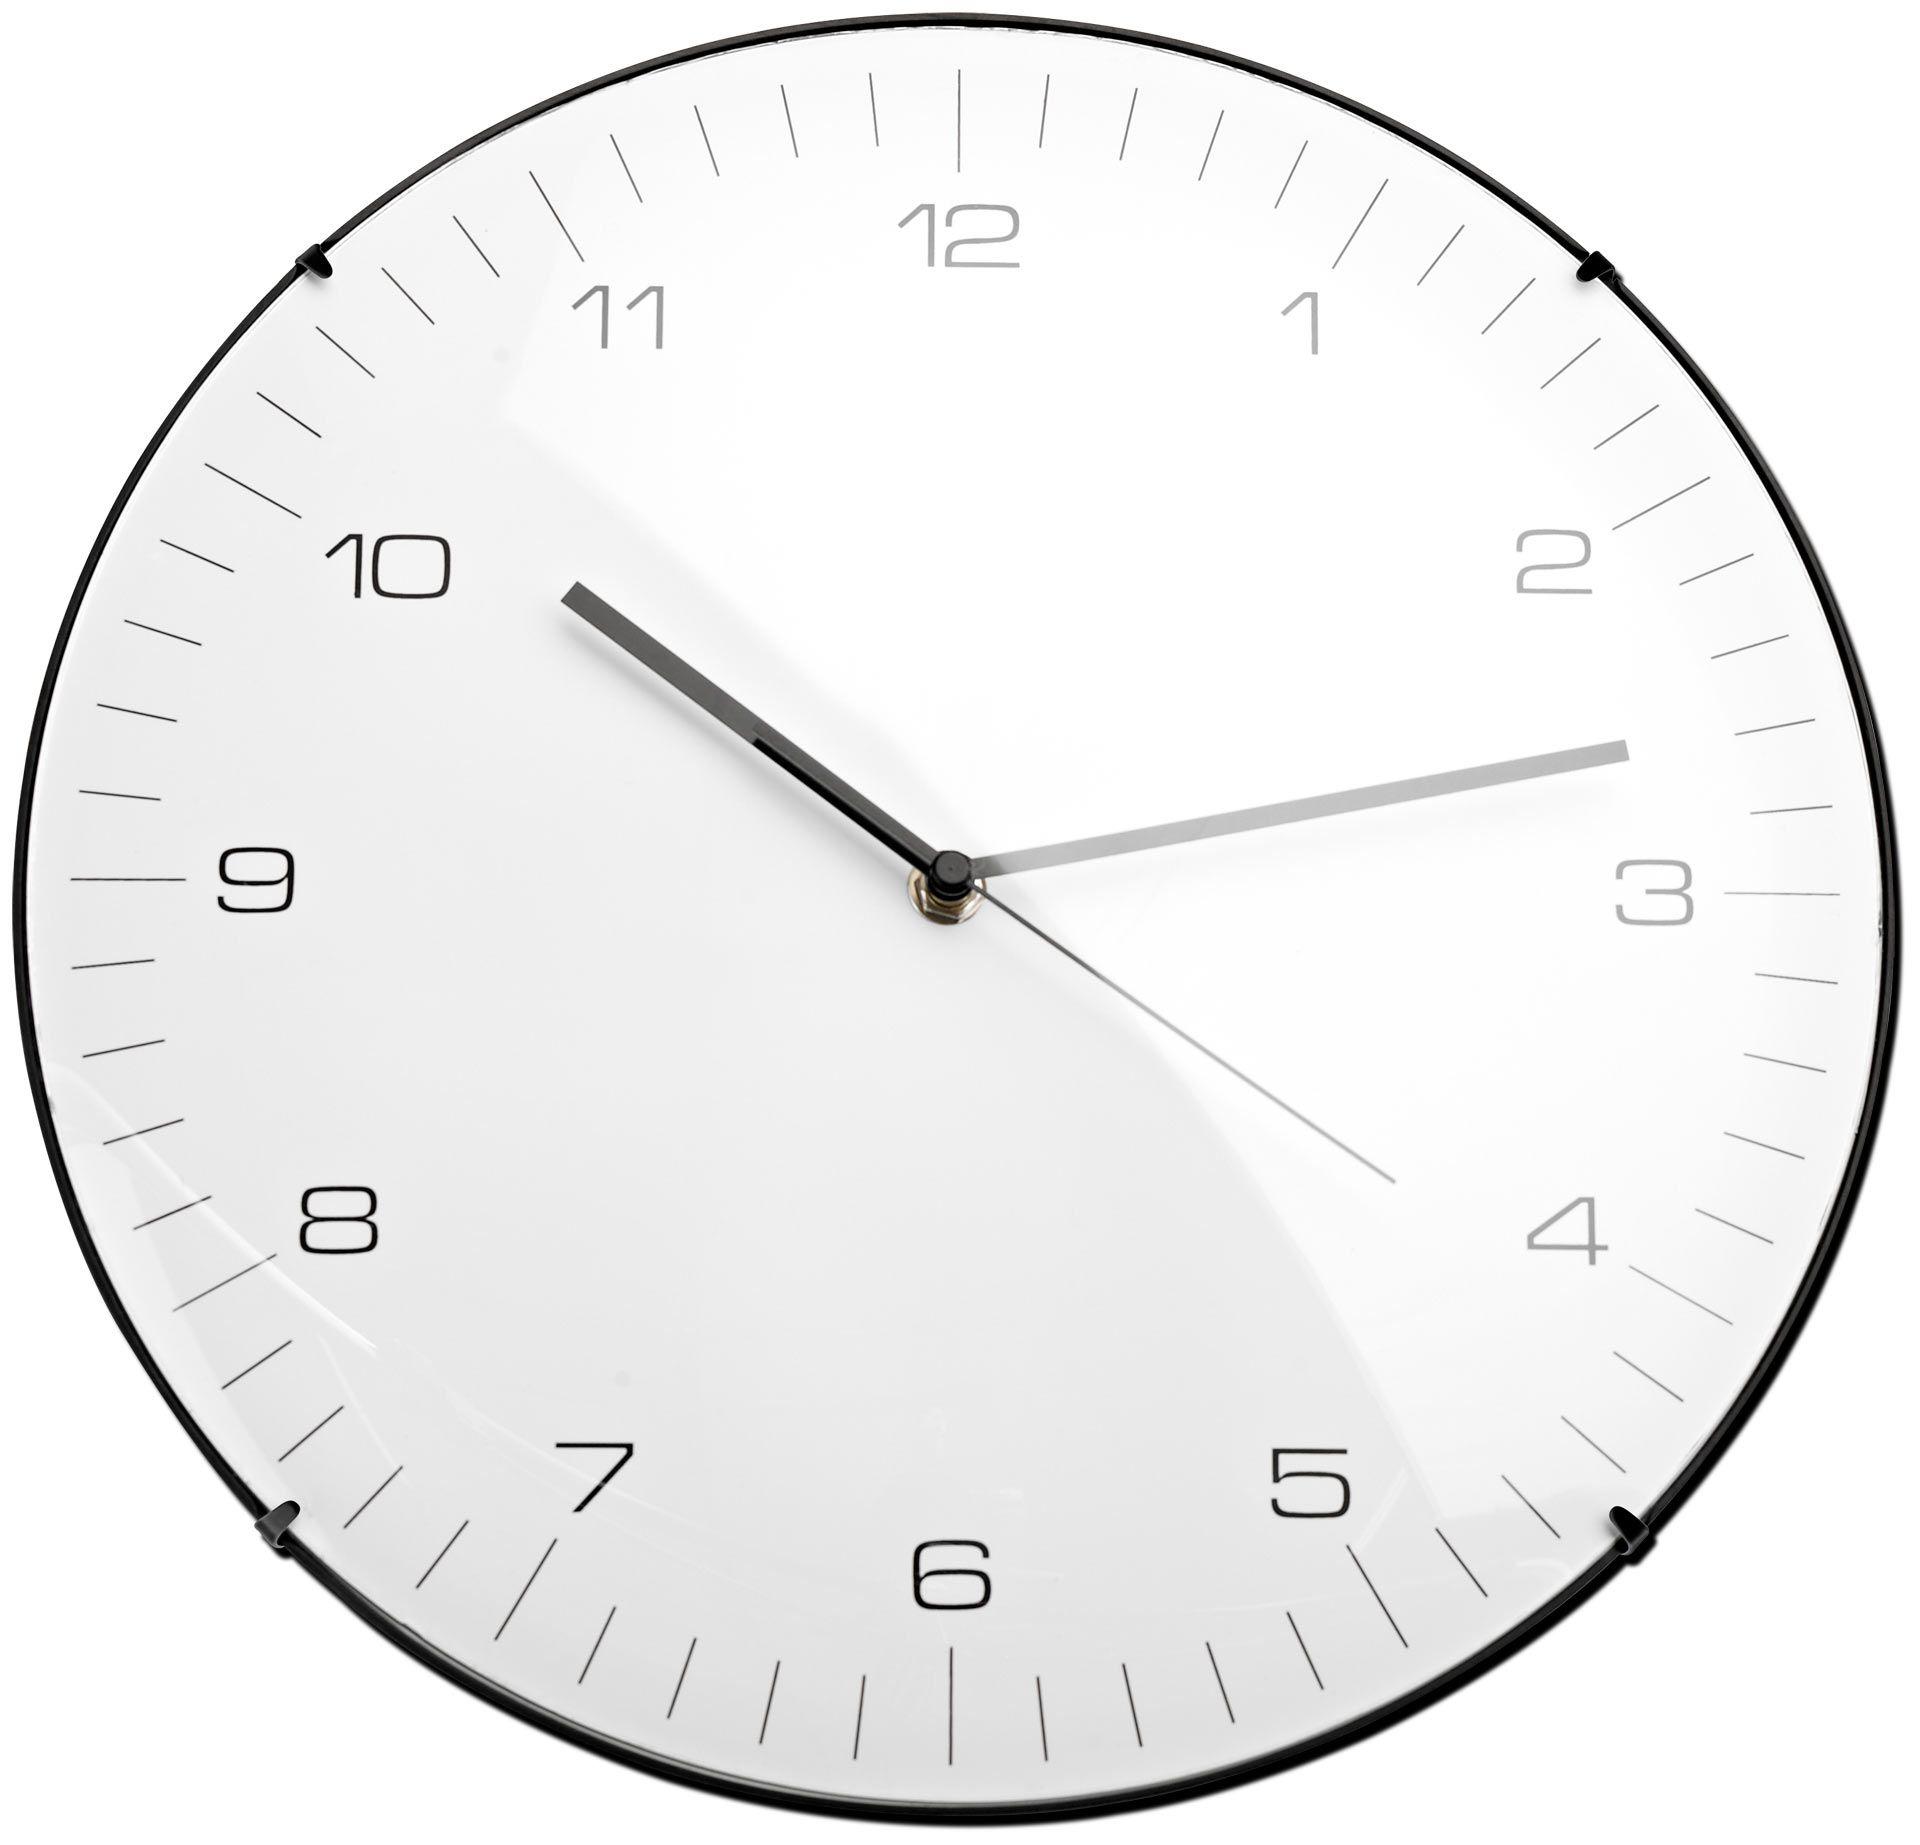 Modern home decor accessories - clocks from BoConcept Furniture ...